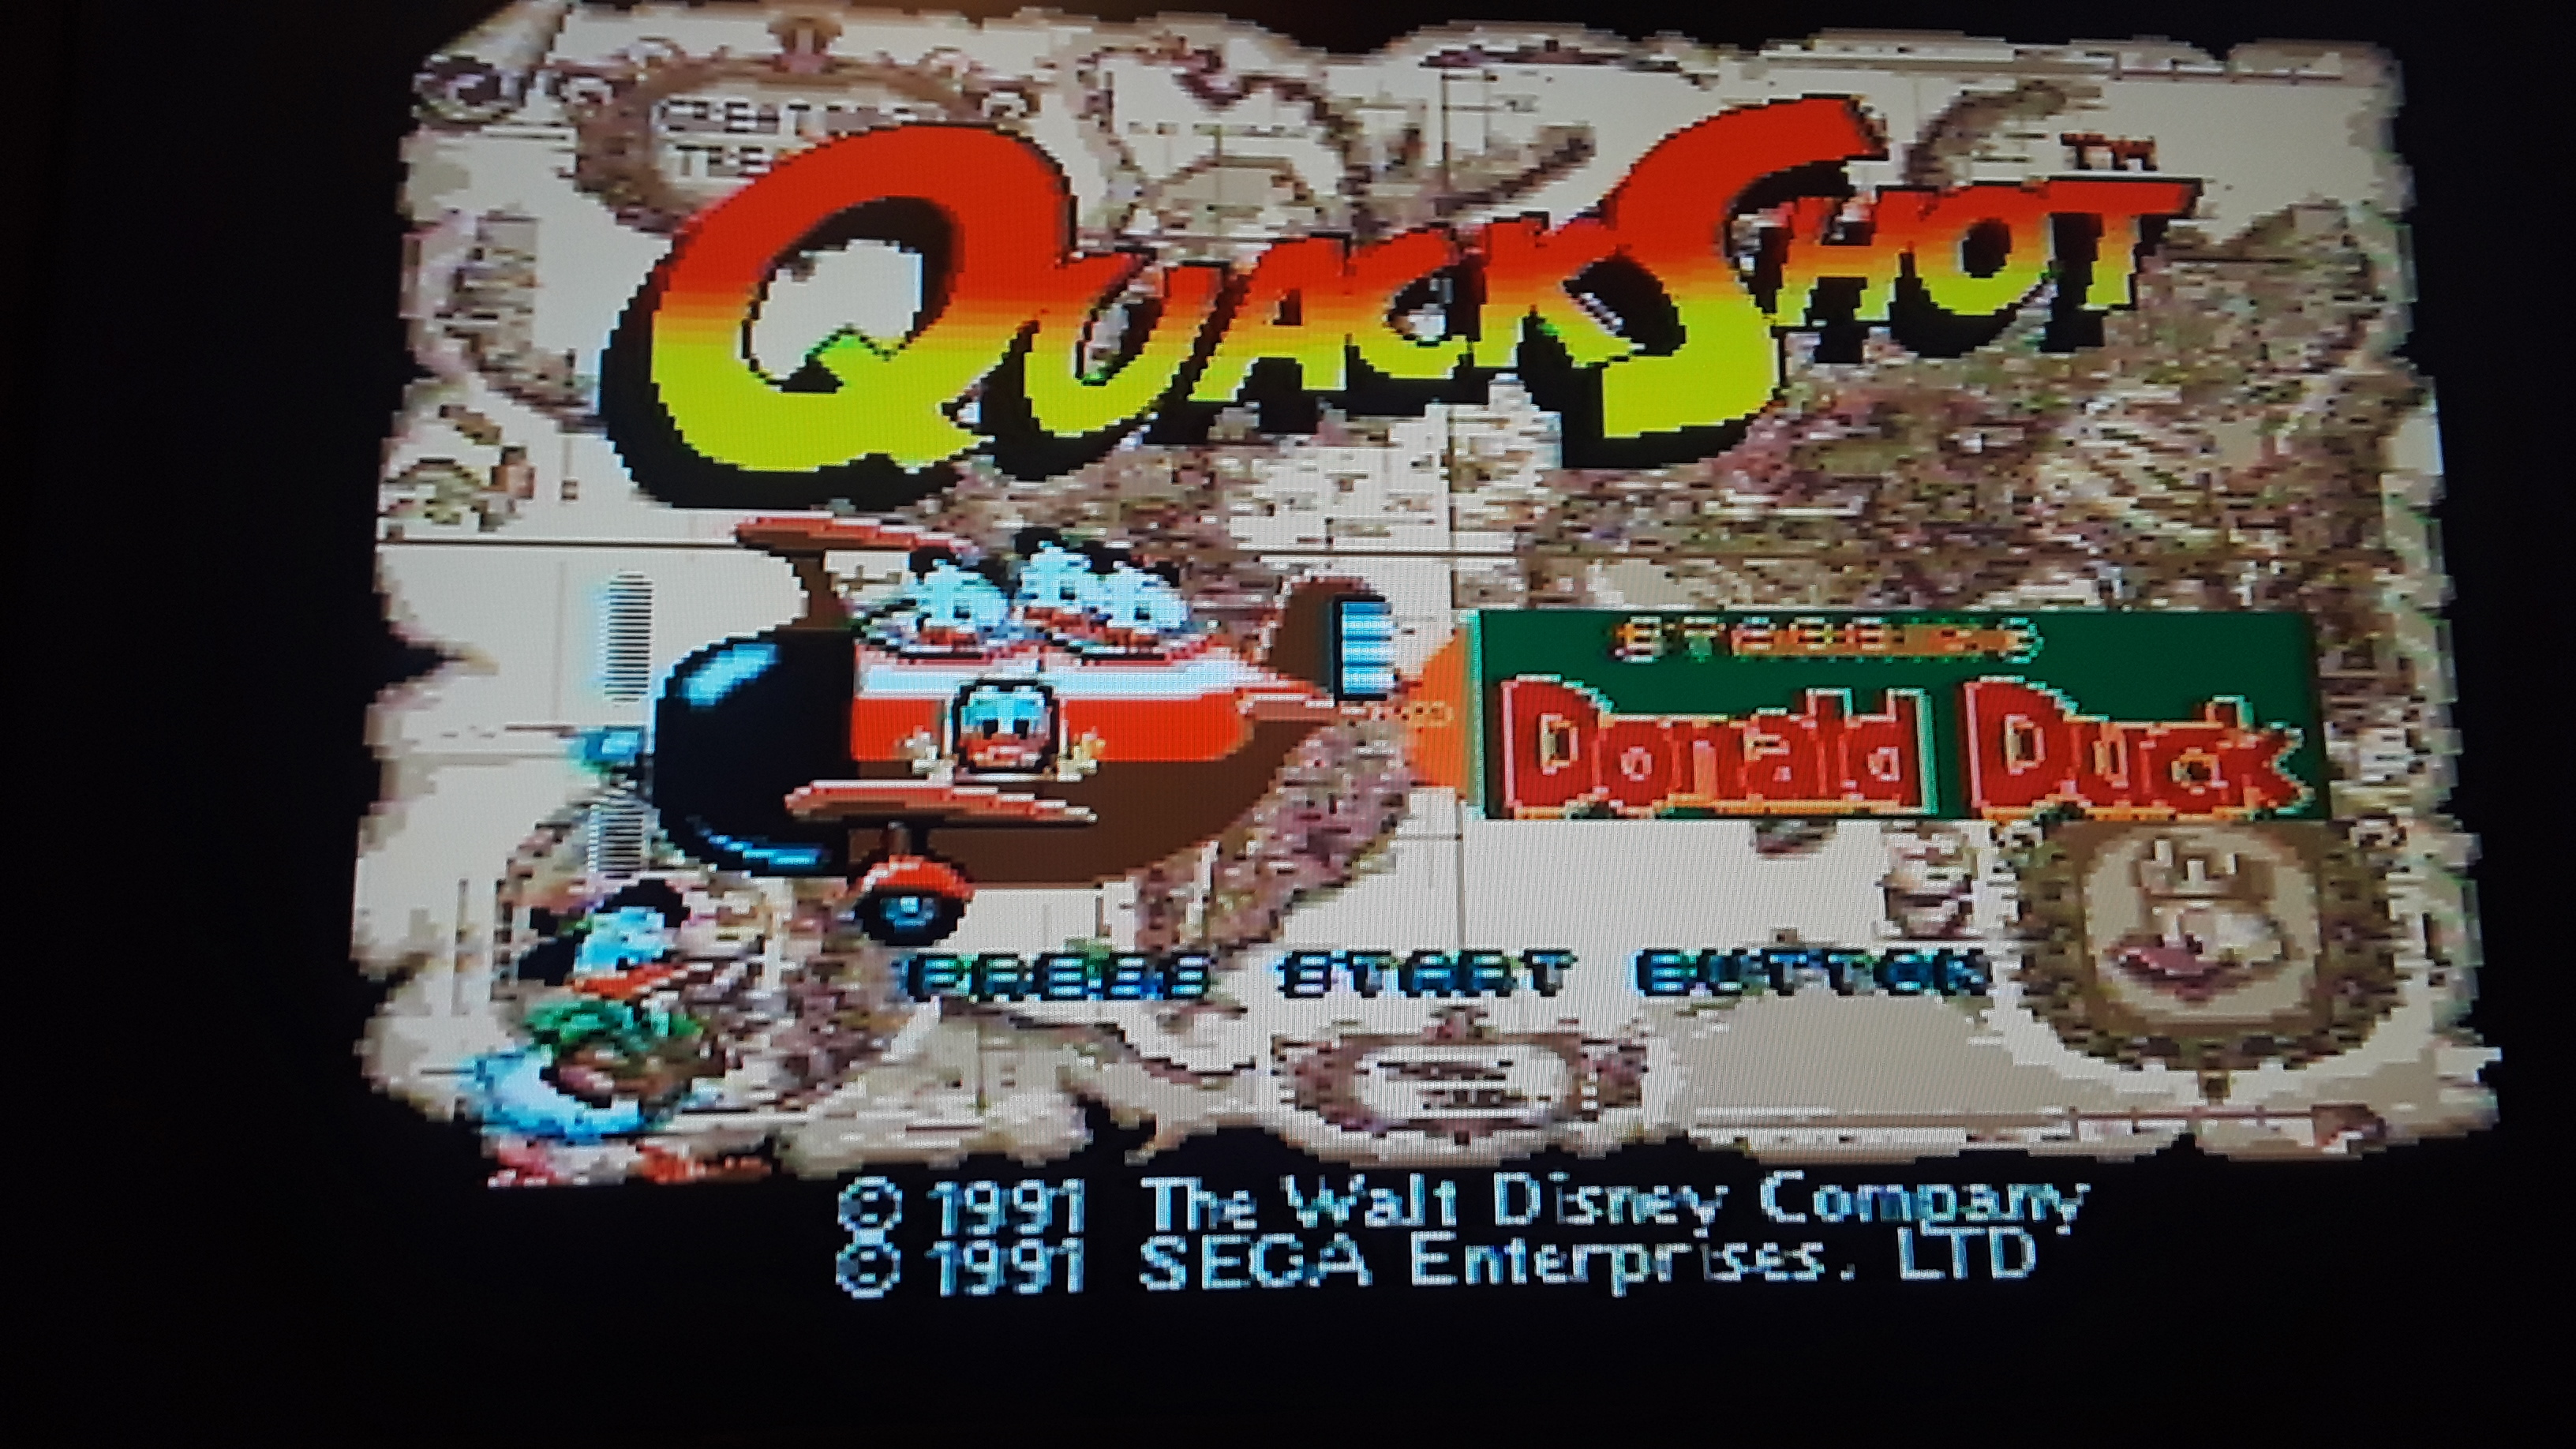 JML101582: Quackshot (Sega Genesis / MegaDrive Emulated) 24,000 points on 2019-10-15 21:11:41